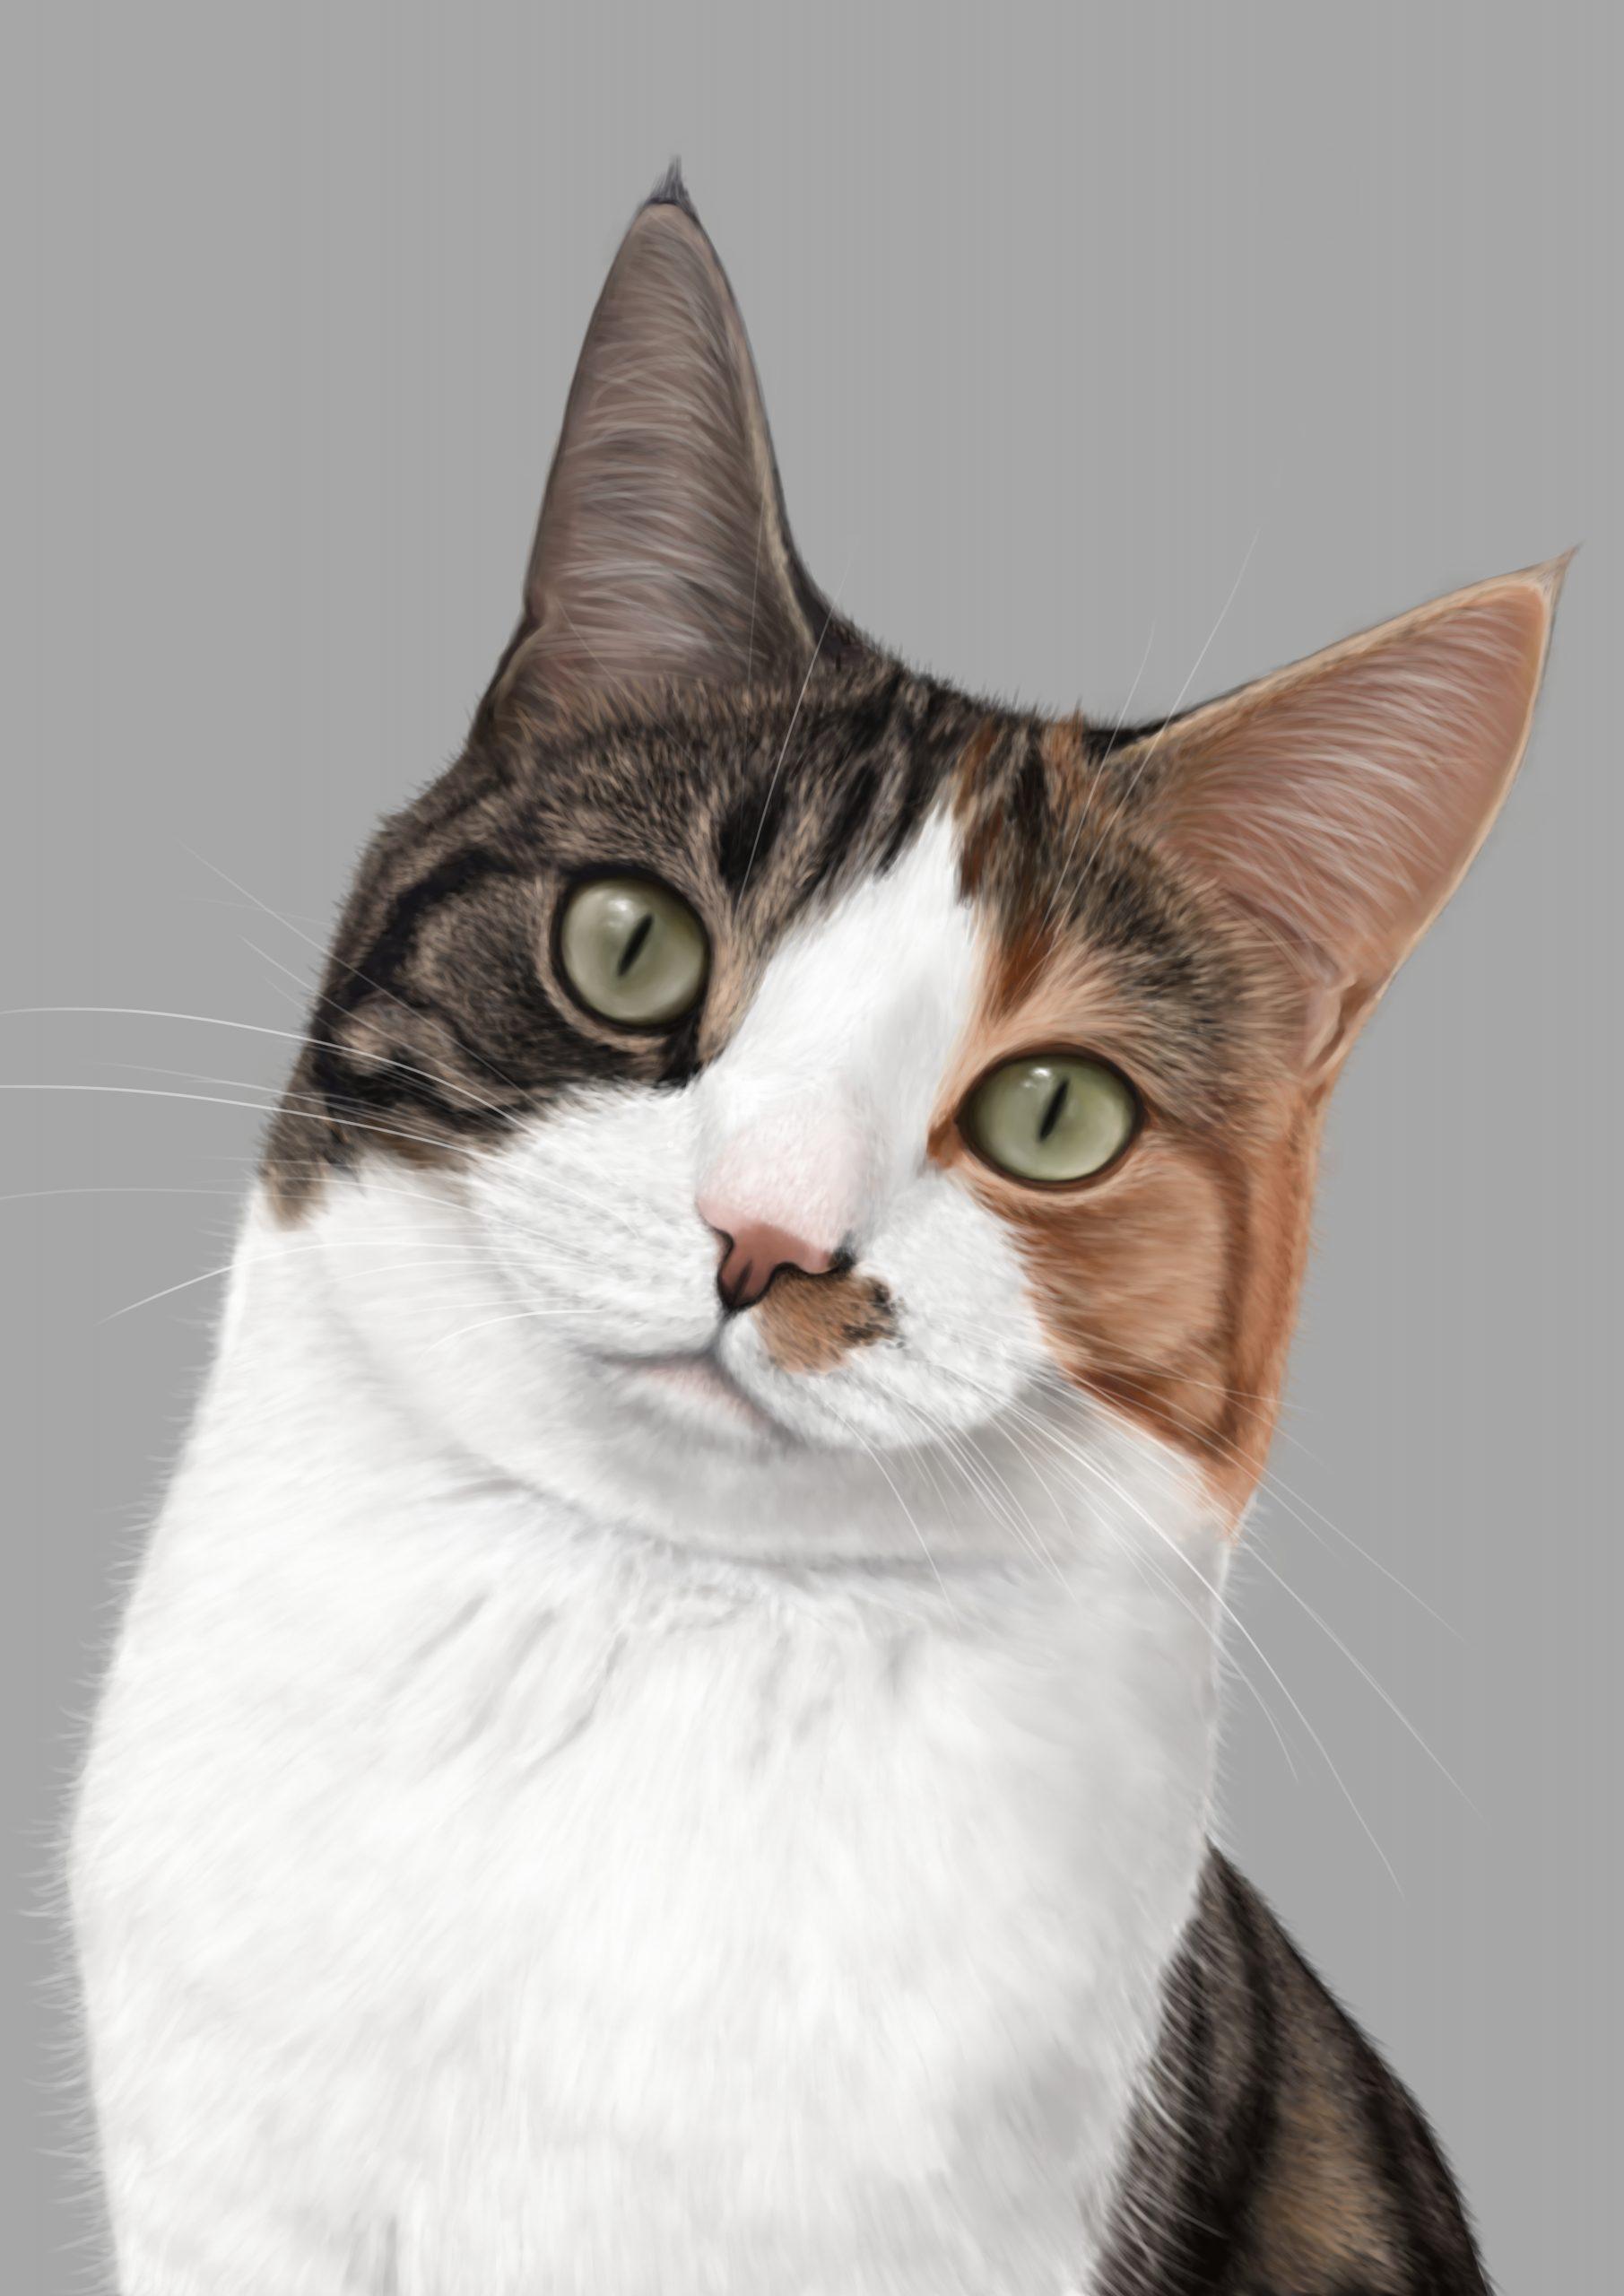 Cat digital artwork painting display tablet portrait